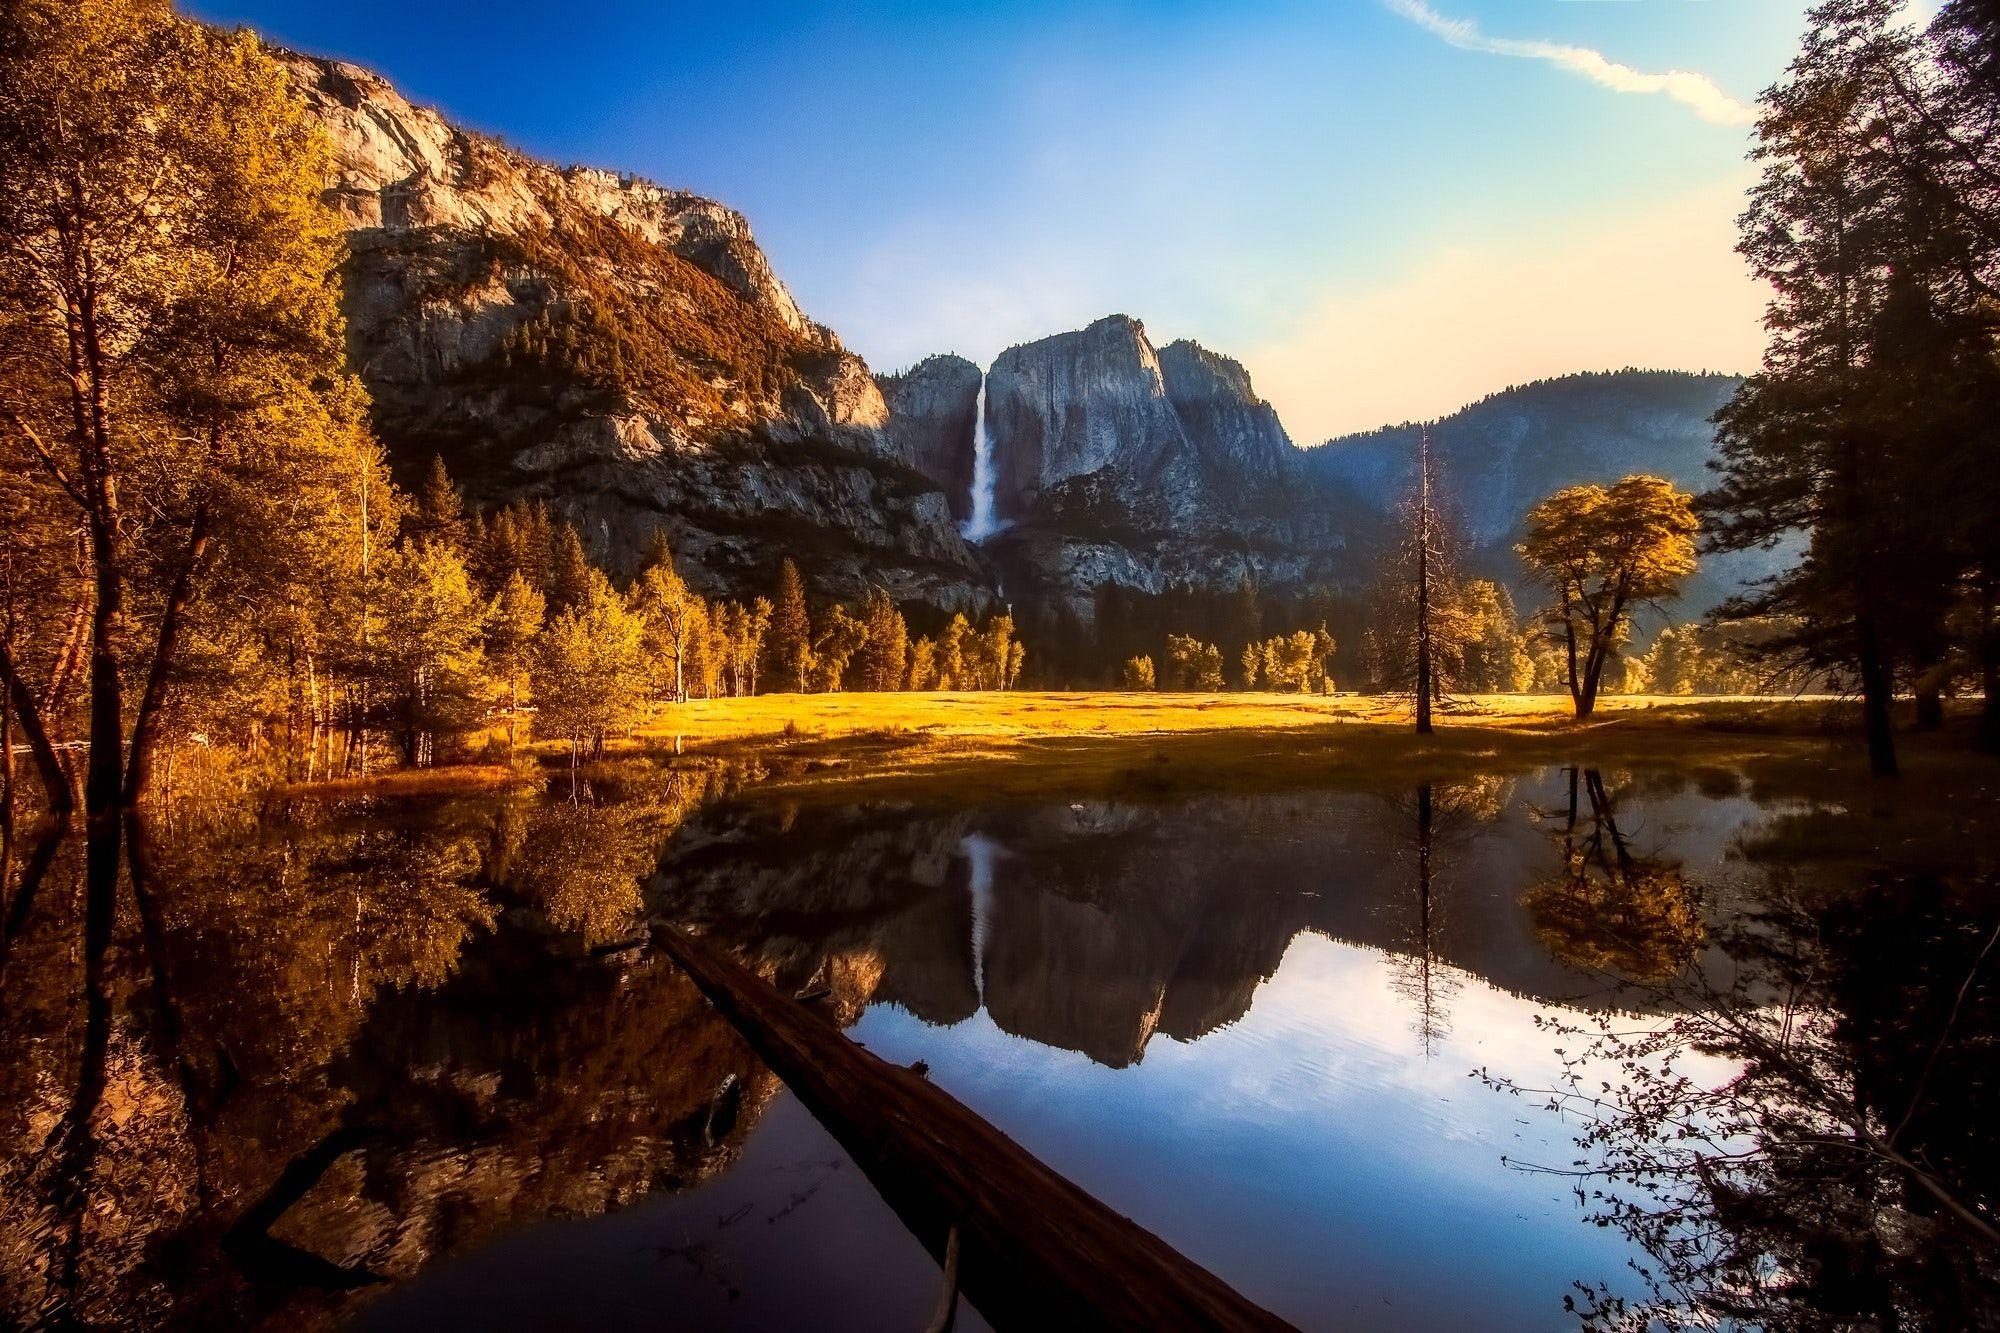 adventure-autumn-california-country-533881.jpg